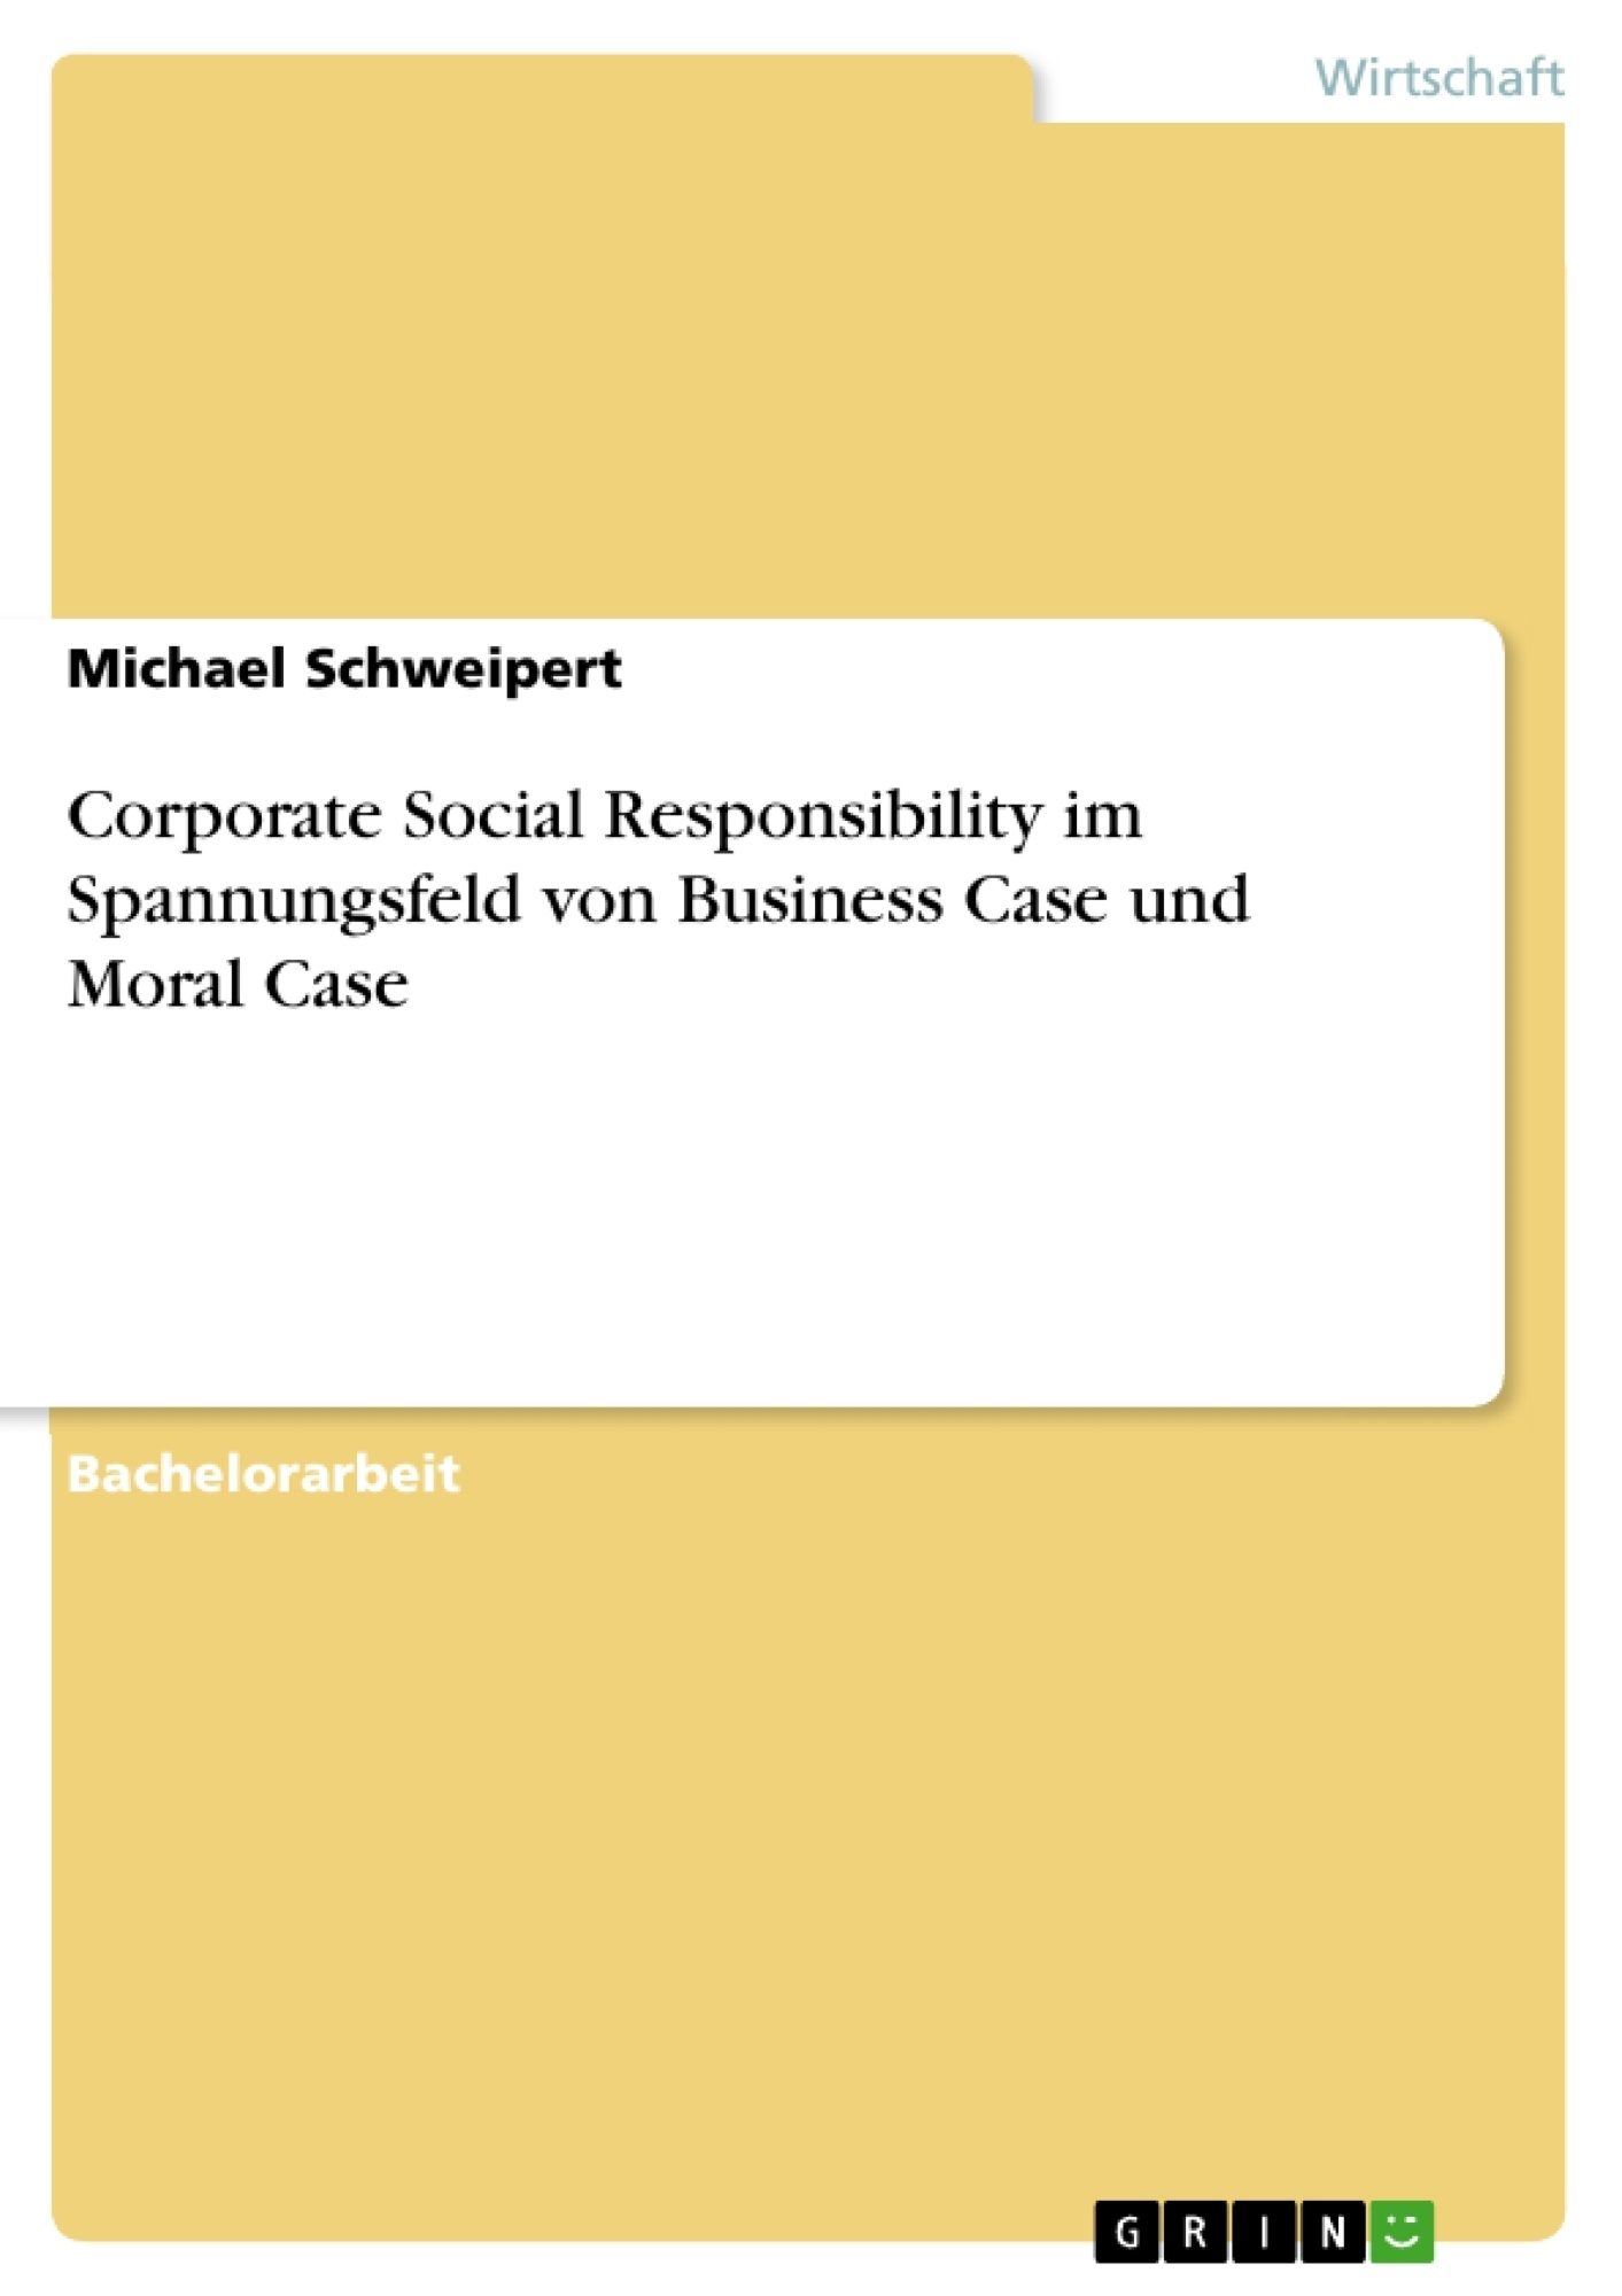 Titel: Corporate Social Responsibility im Spannungsfeld von Business Case und Moral Case